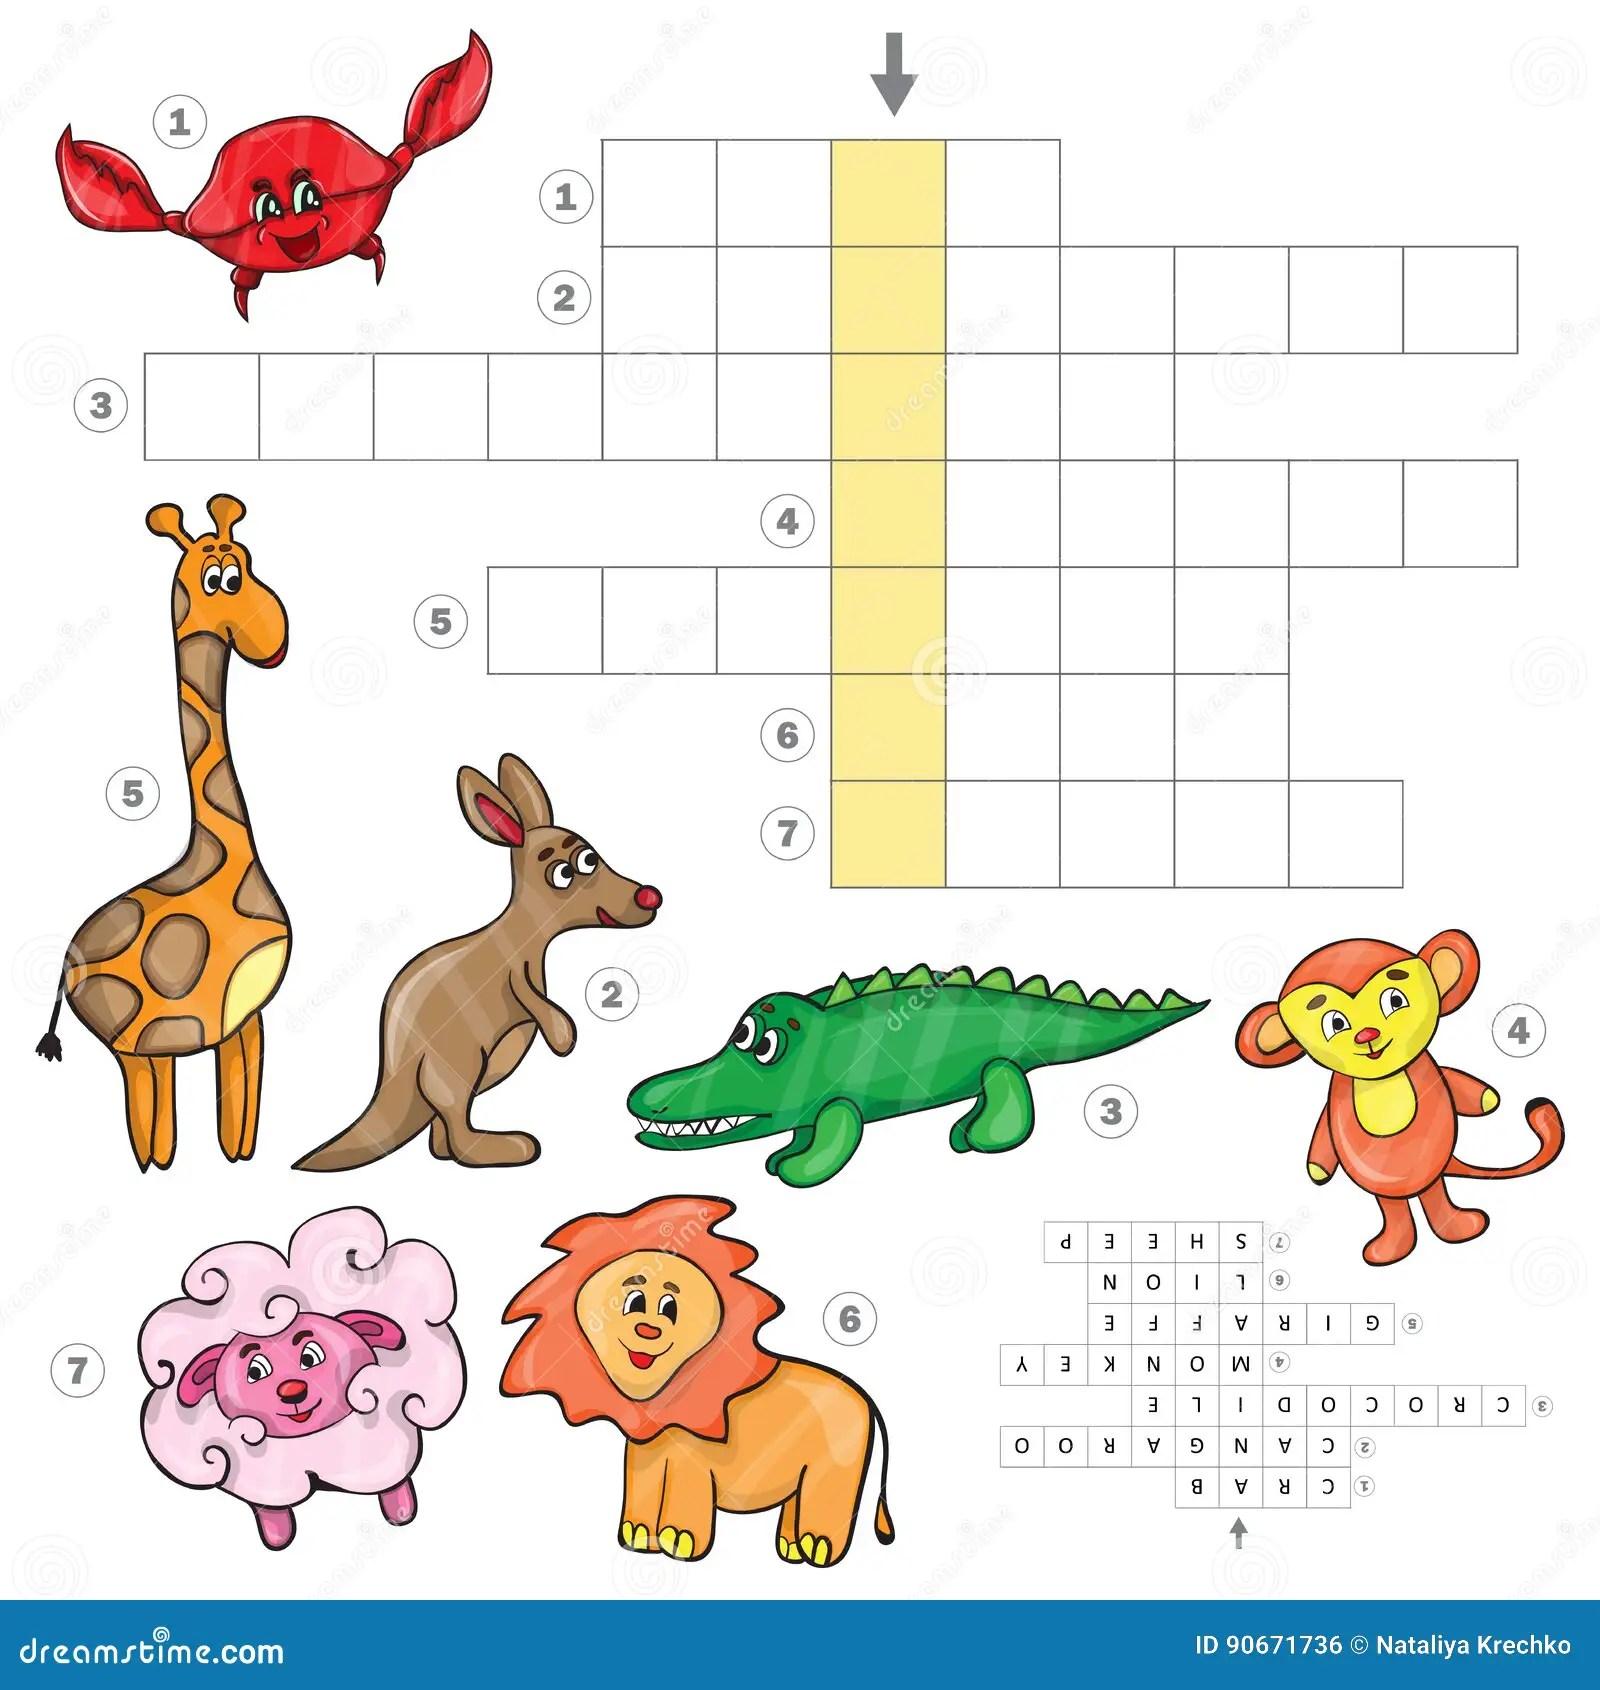 Cartoon Crossword Game With Cute Cartoon African Animals